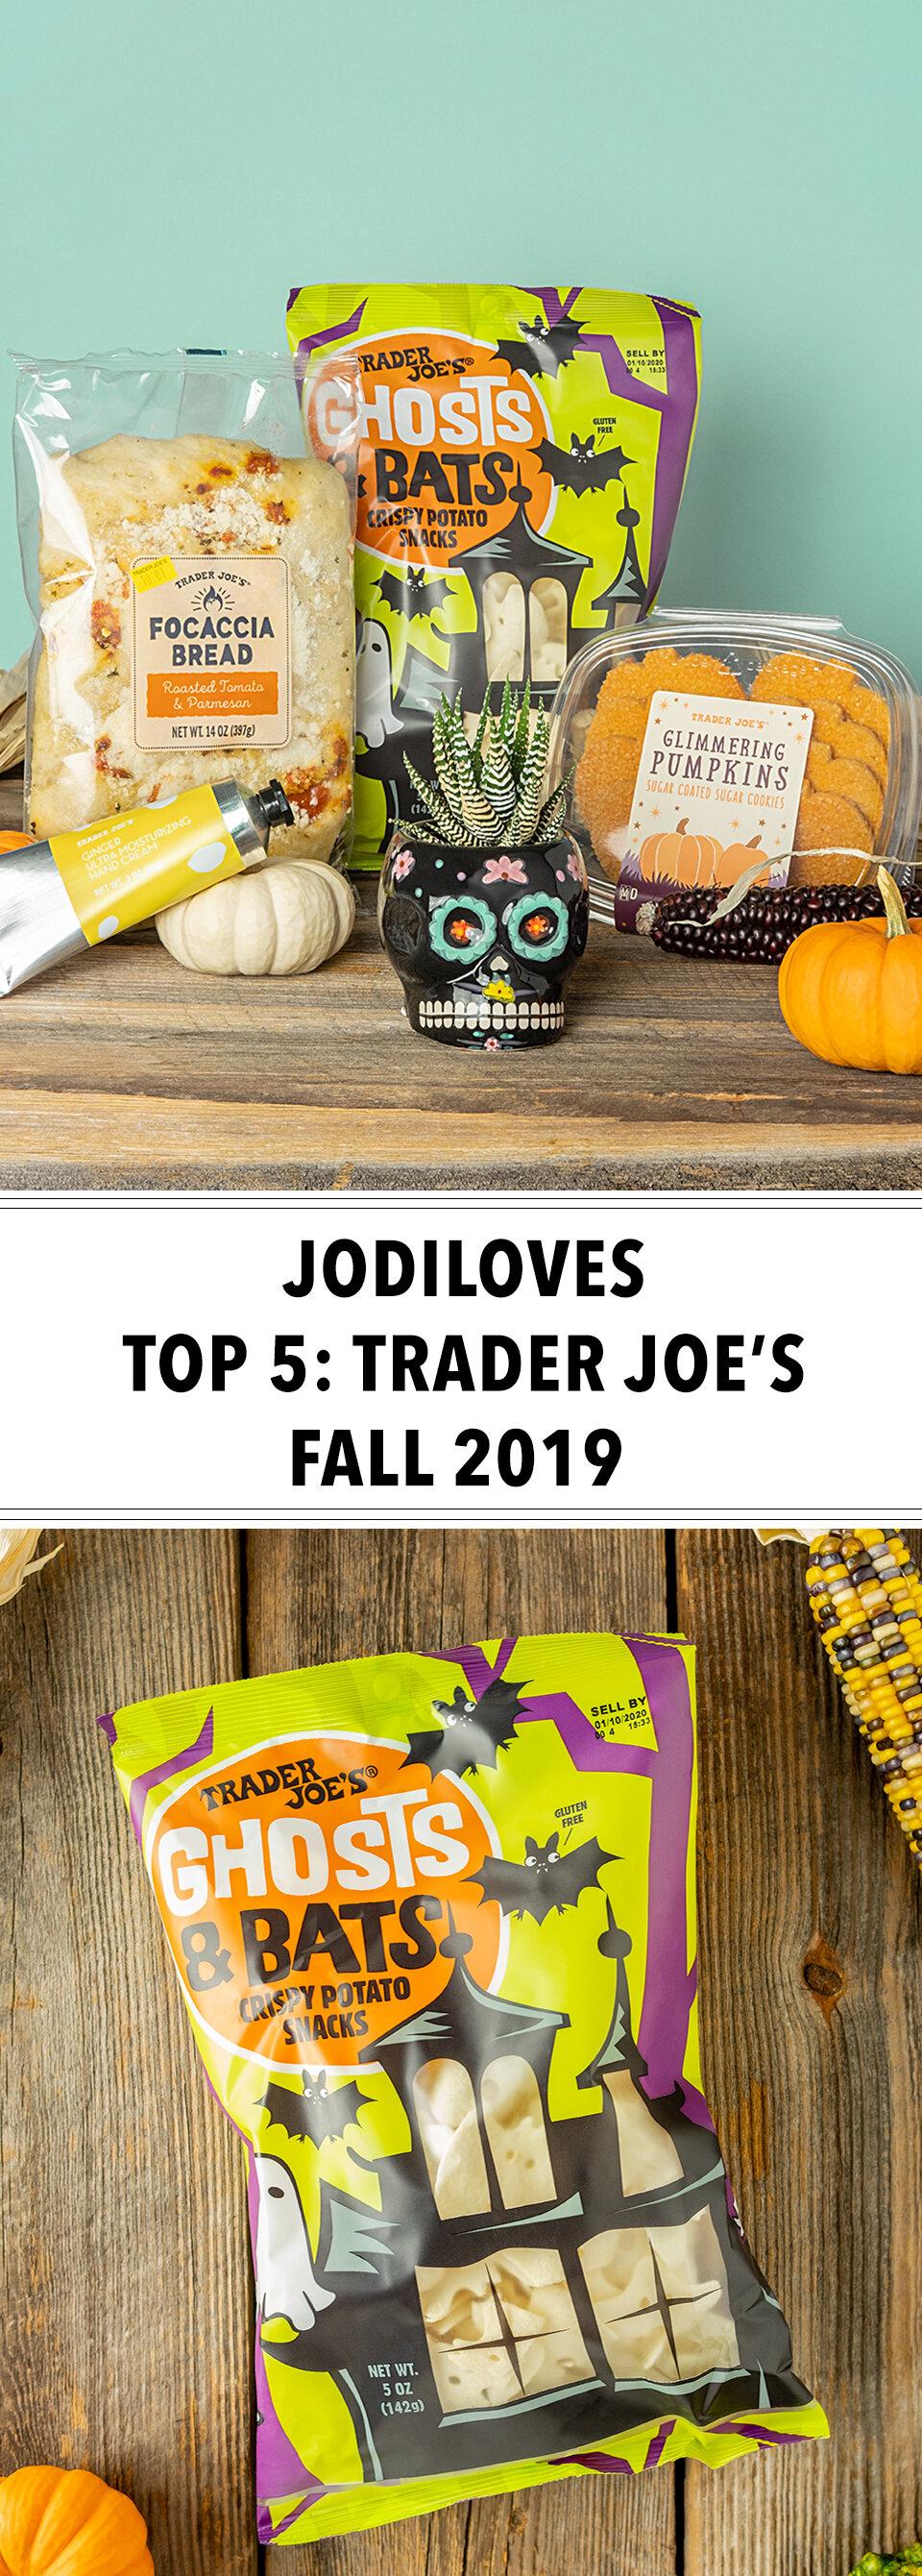 JodiLoves_Retouching_Brilliant_Pixel_Imaging-Top-5-Trader-Joes-Fall-2019.jpg